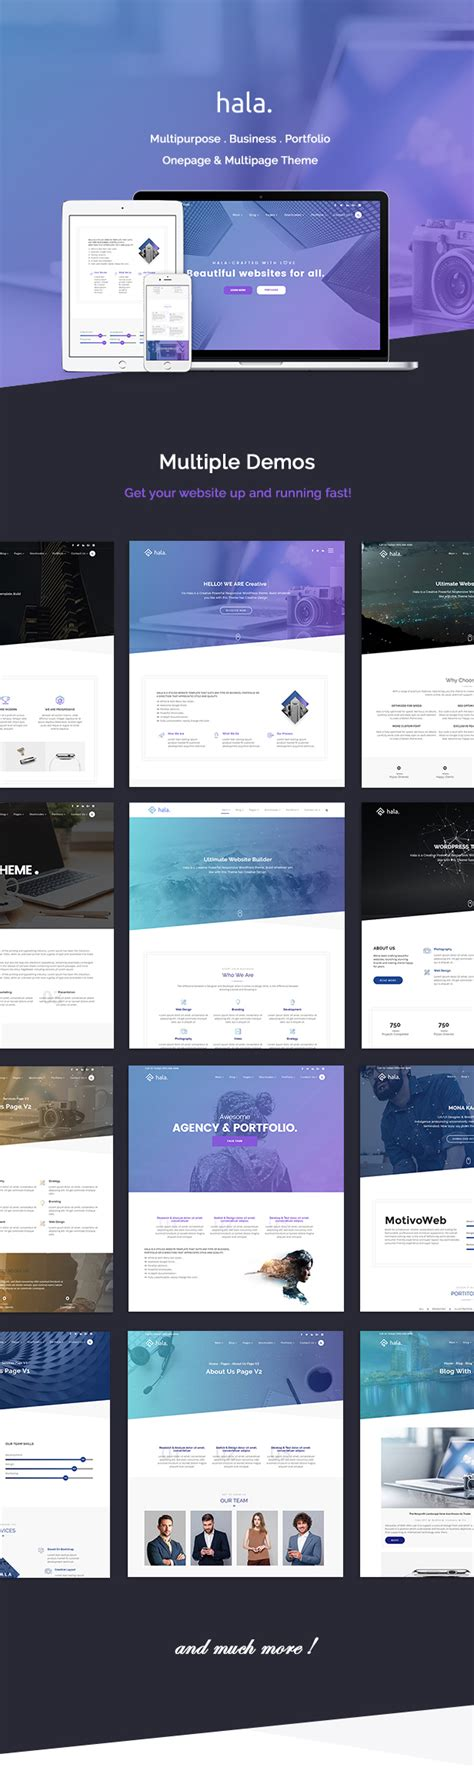 ps4 themes installieren hala creative multi purpose wordpress theme webdesign